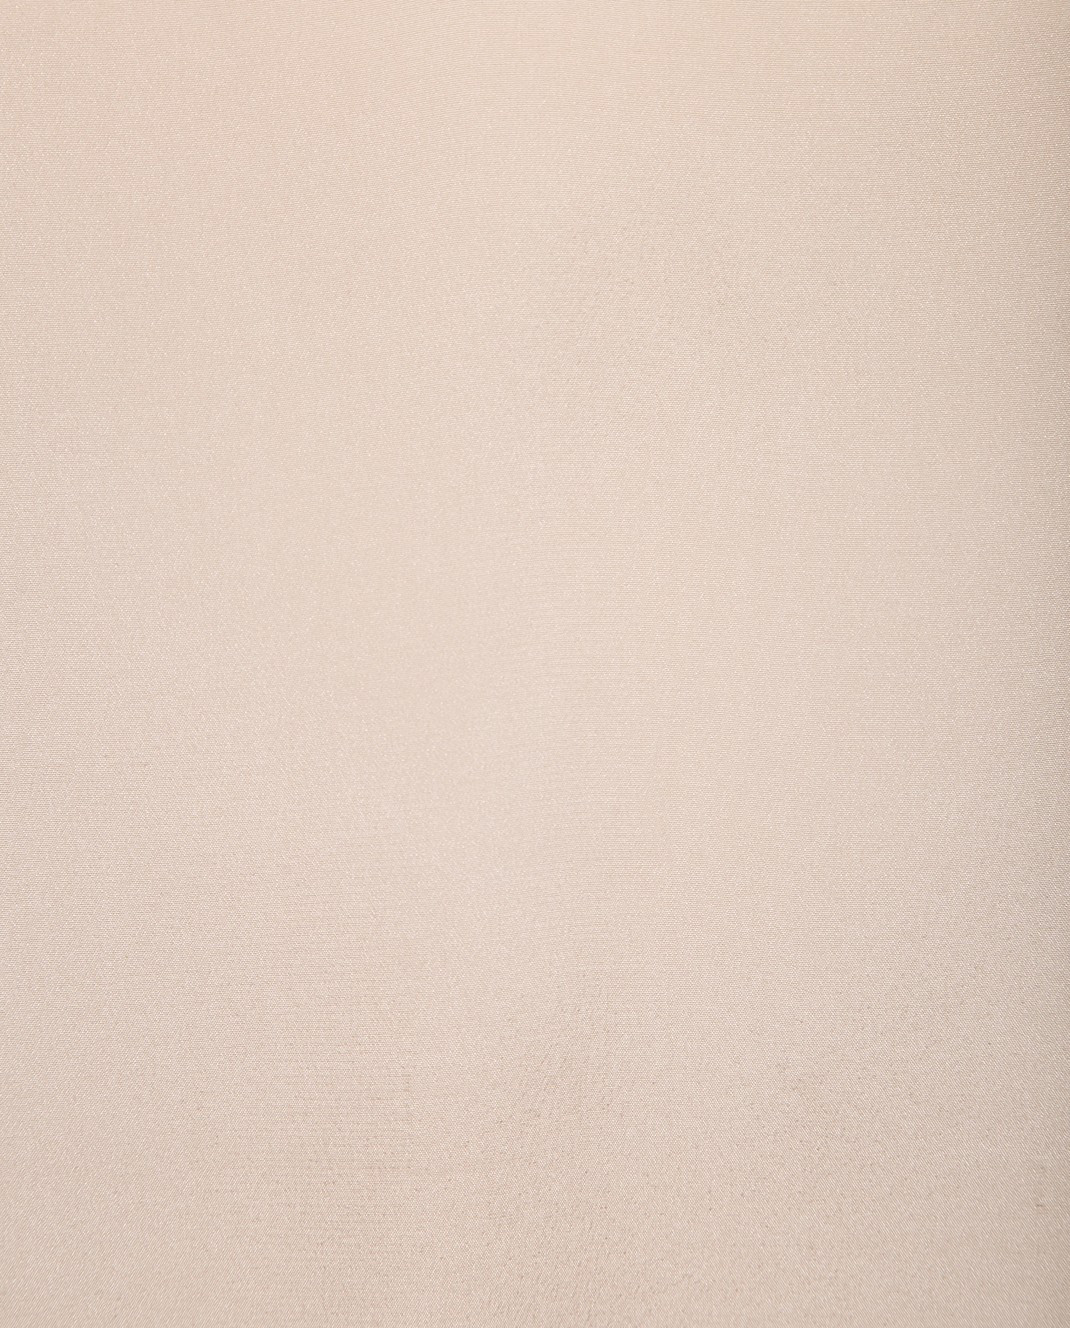 Alexander Terekhov Бежевый топ из шелка TP0851415 изображение 6